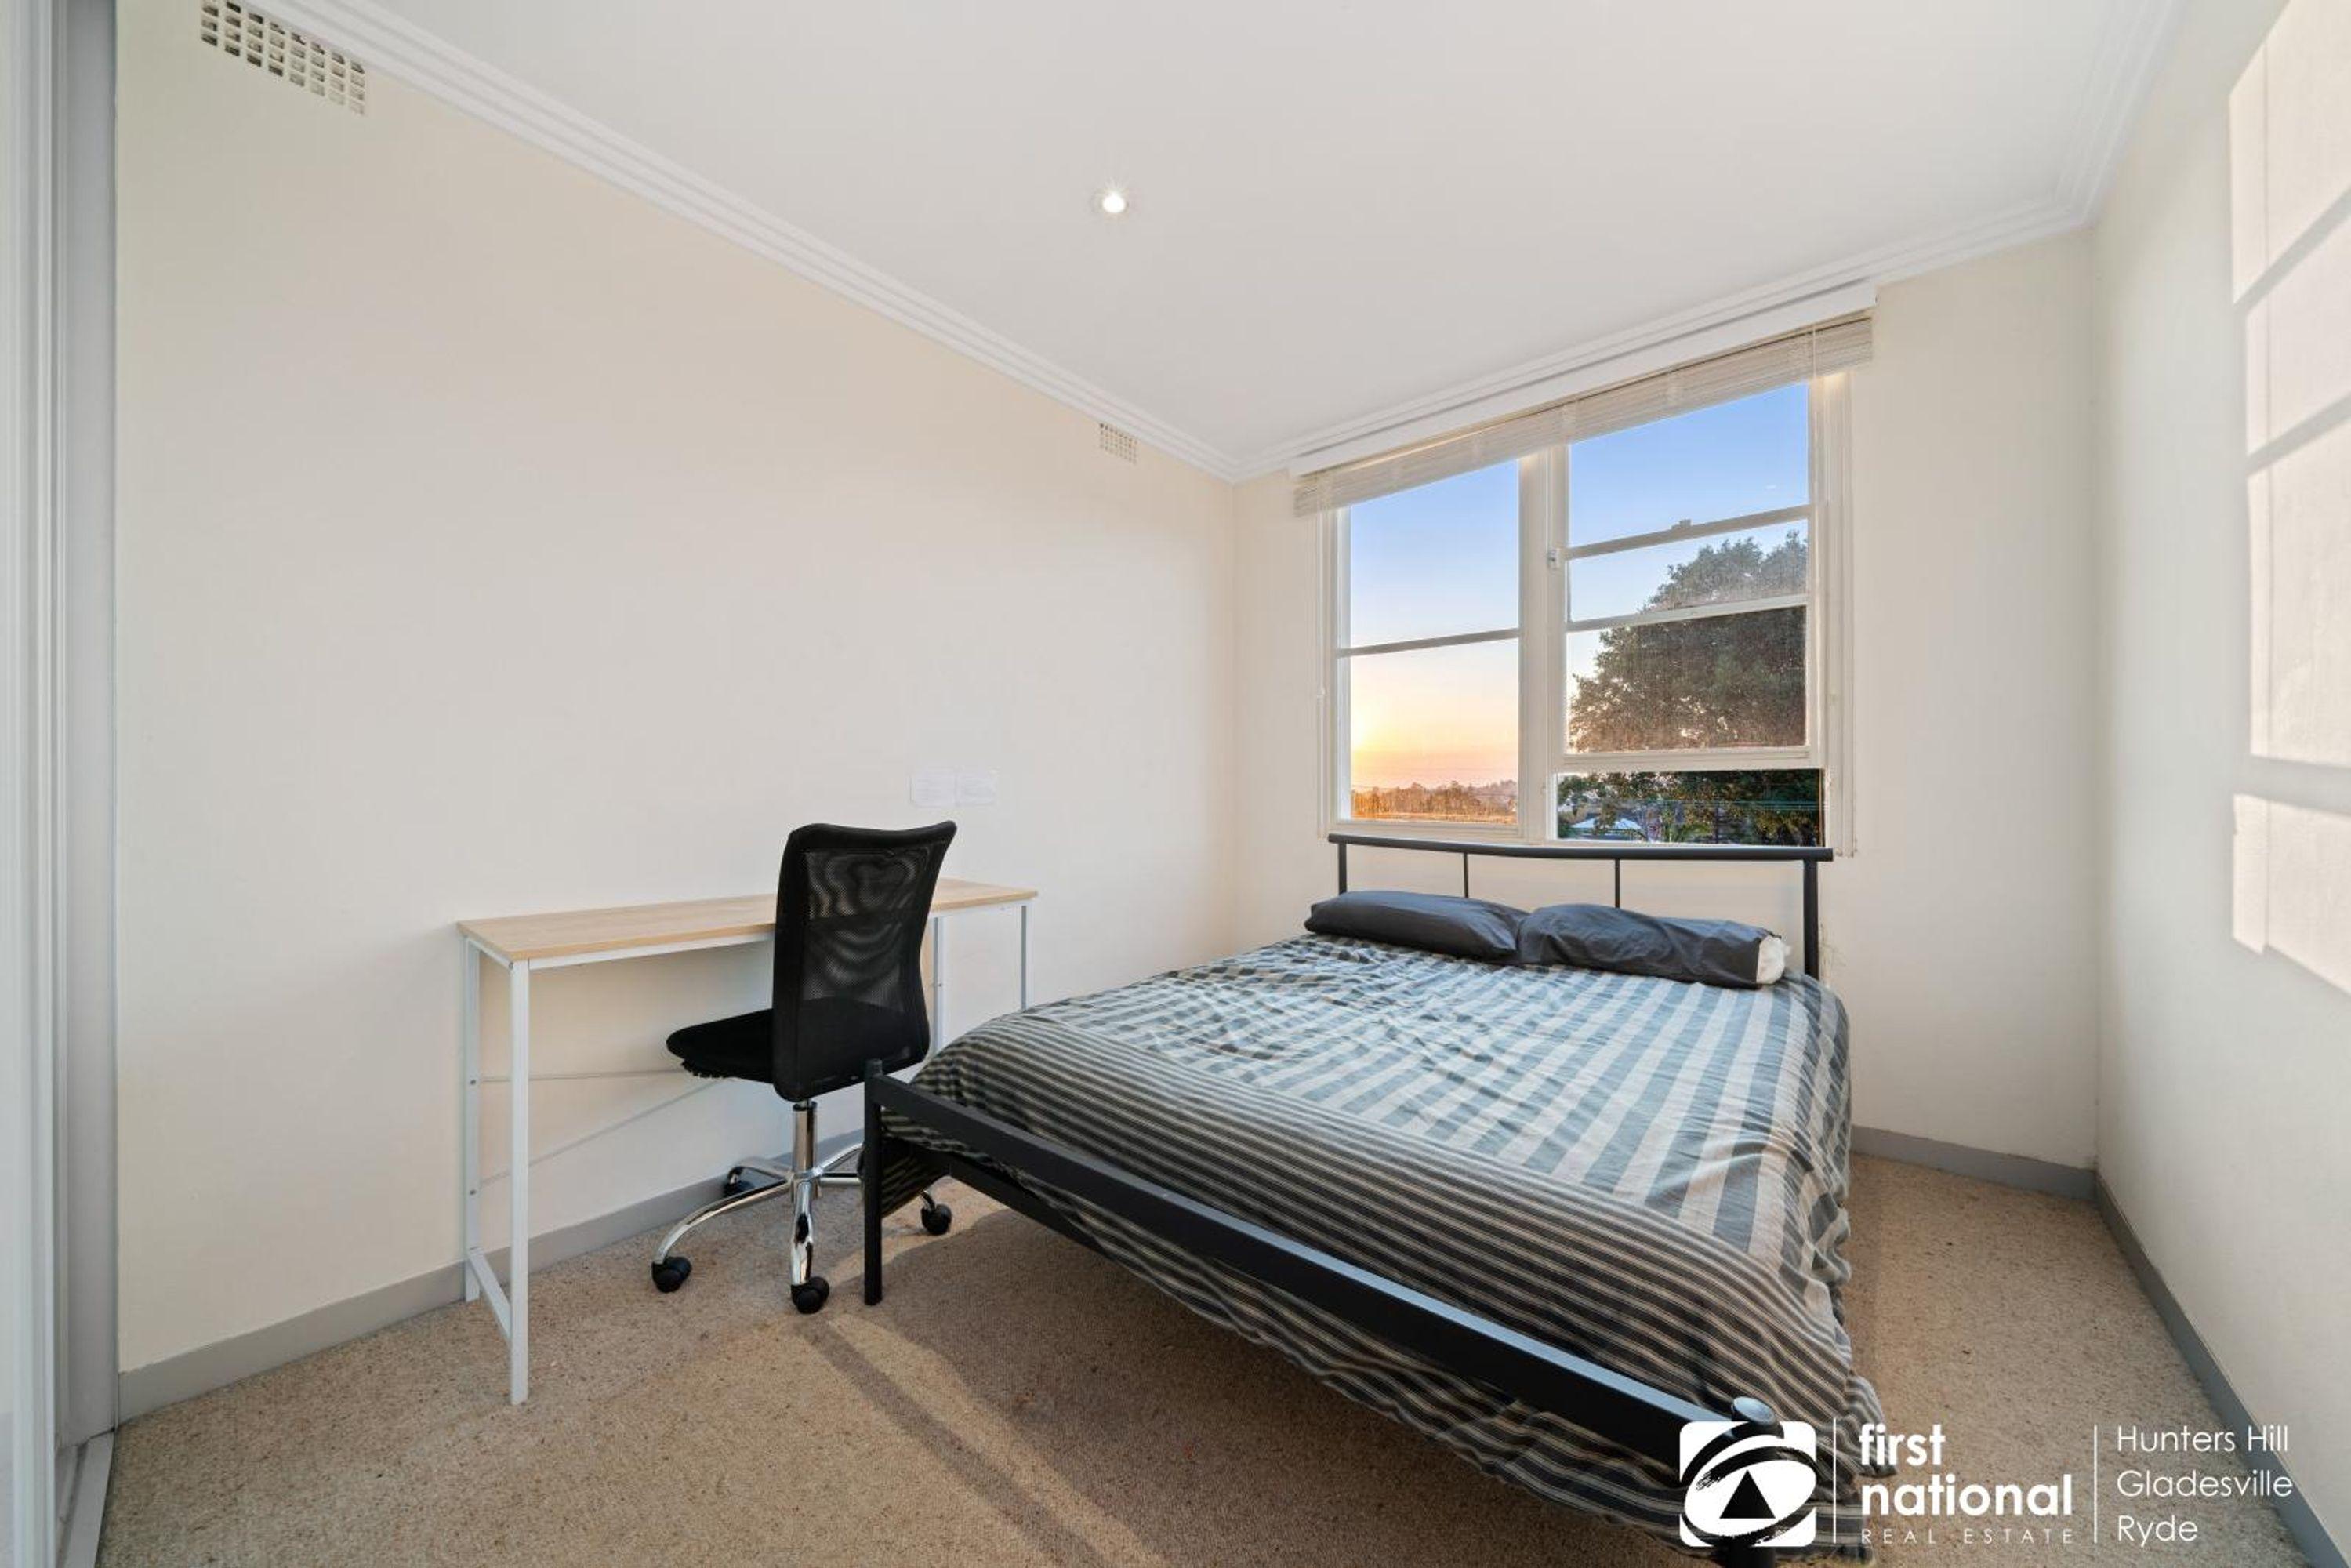 3/10 Ross Street, Gladesville, NSW 2111